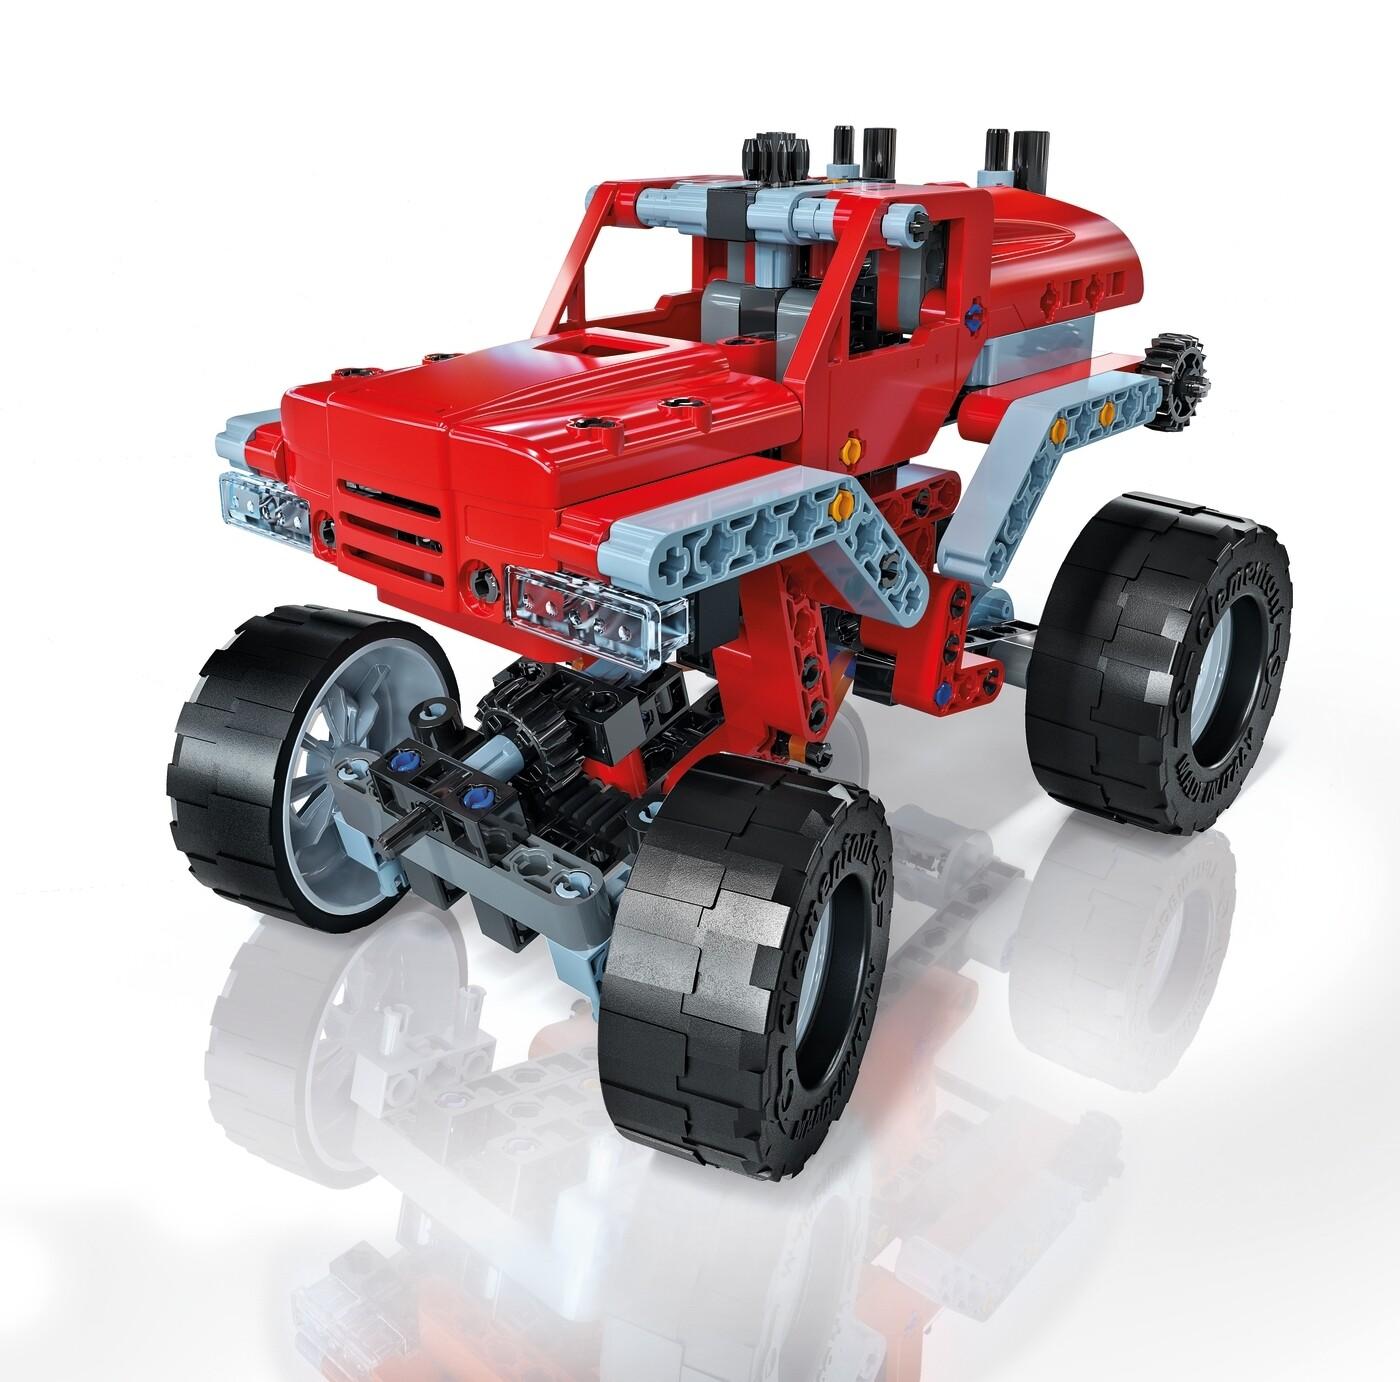 Laboratorio de Mecanica  - Monster Truck